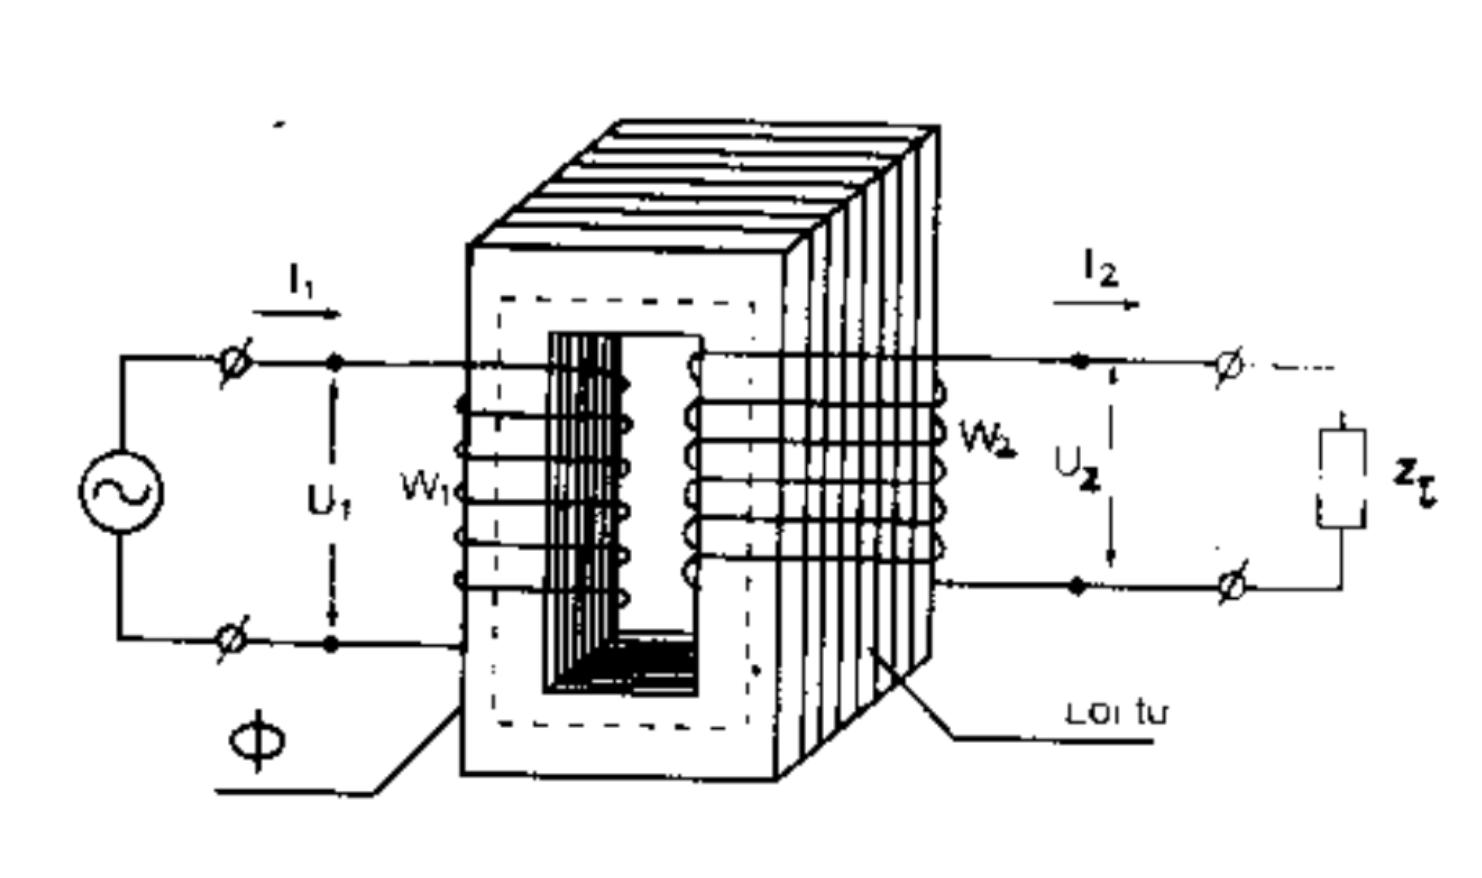 Cấu trúc đơn giản của máy biến áp